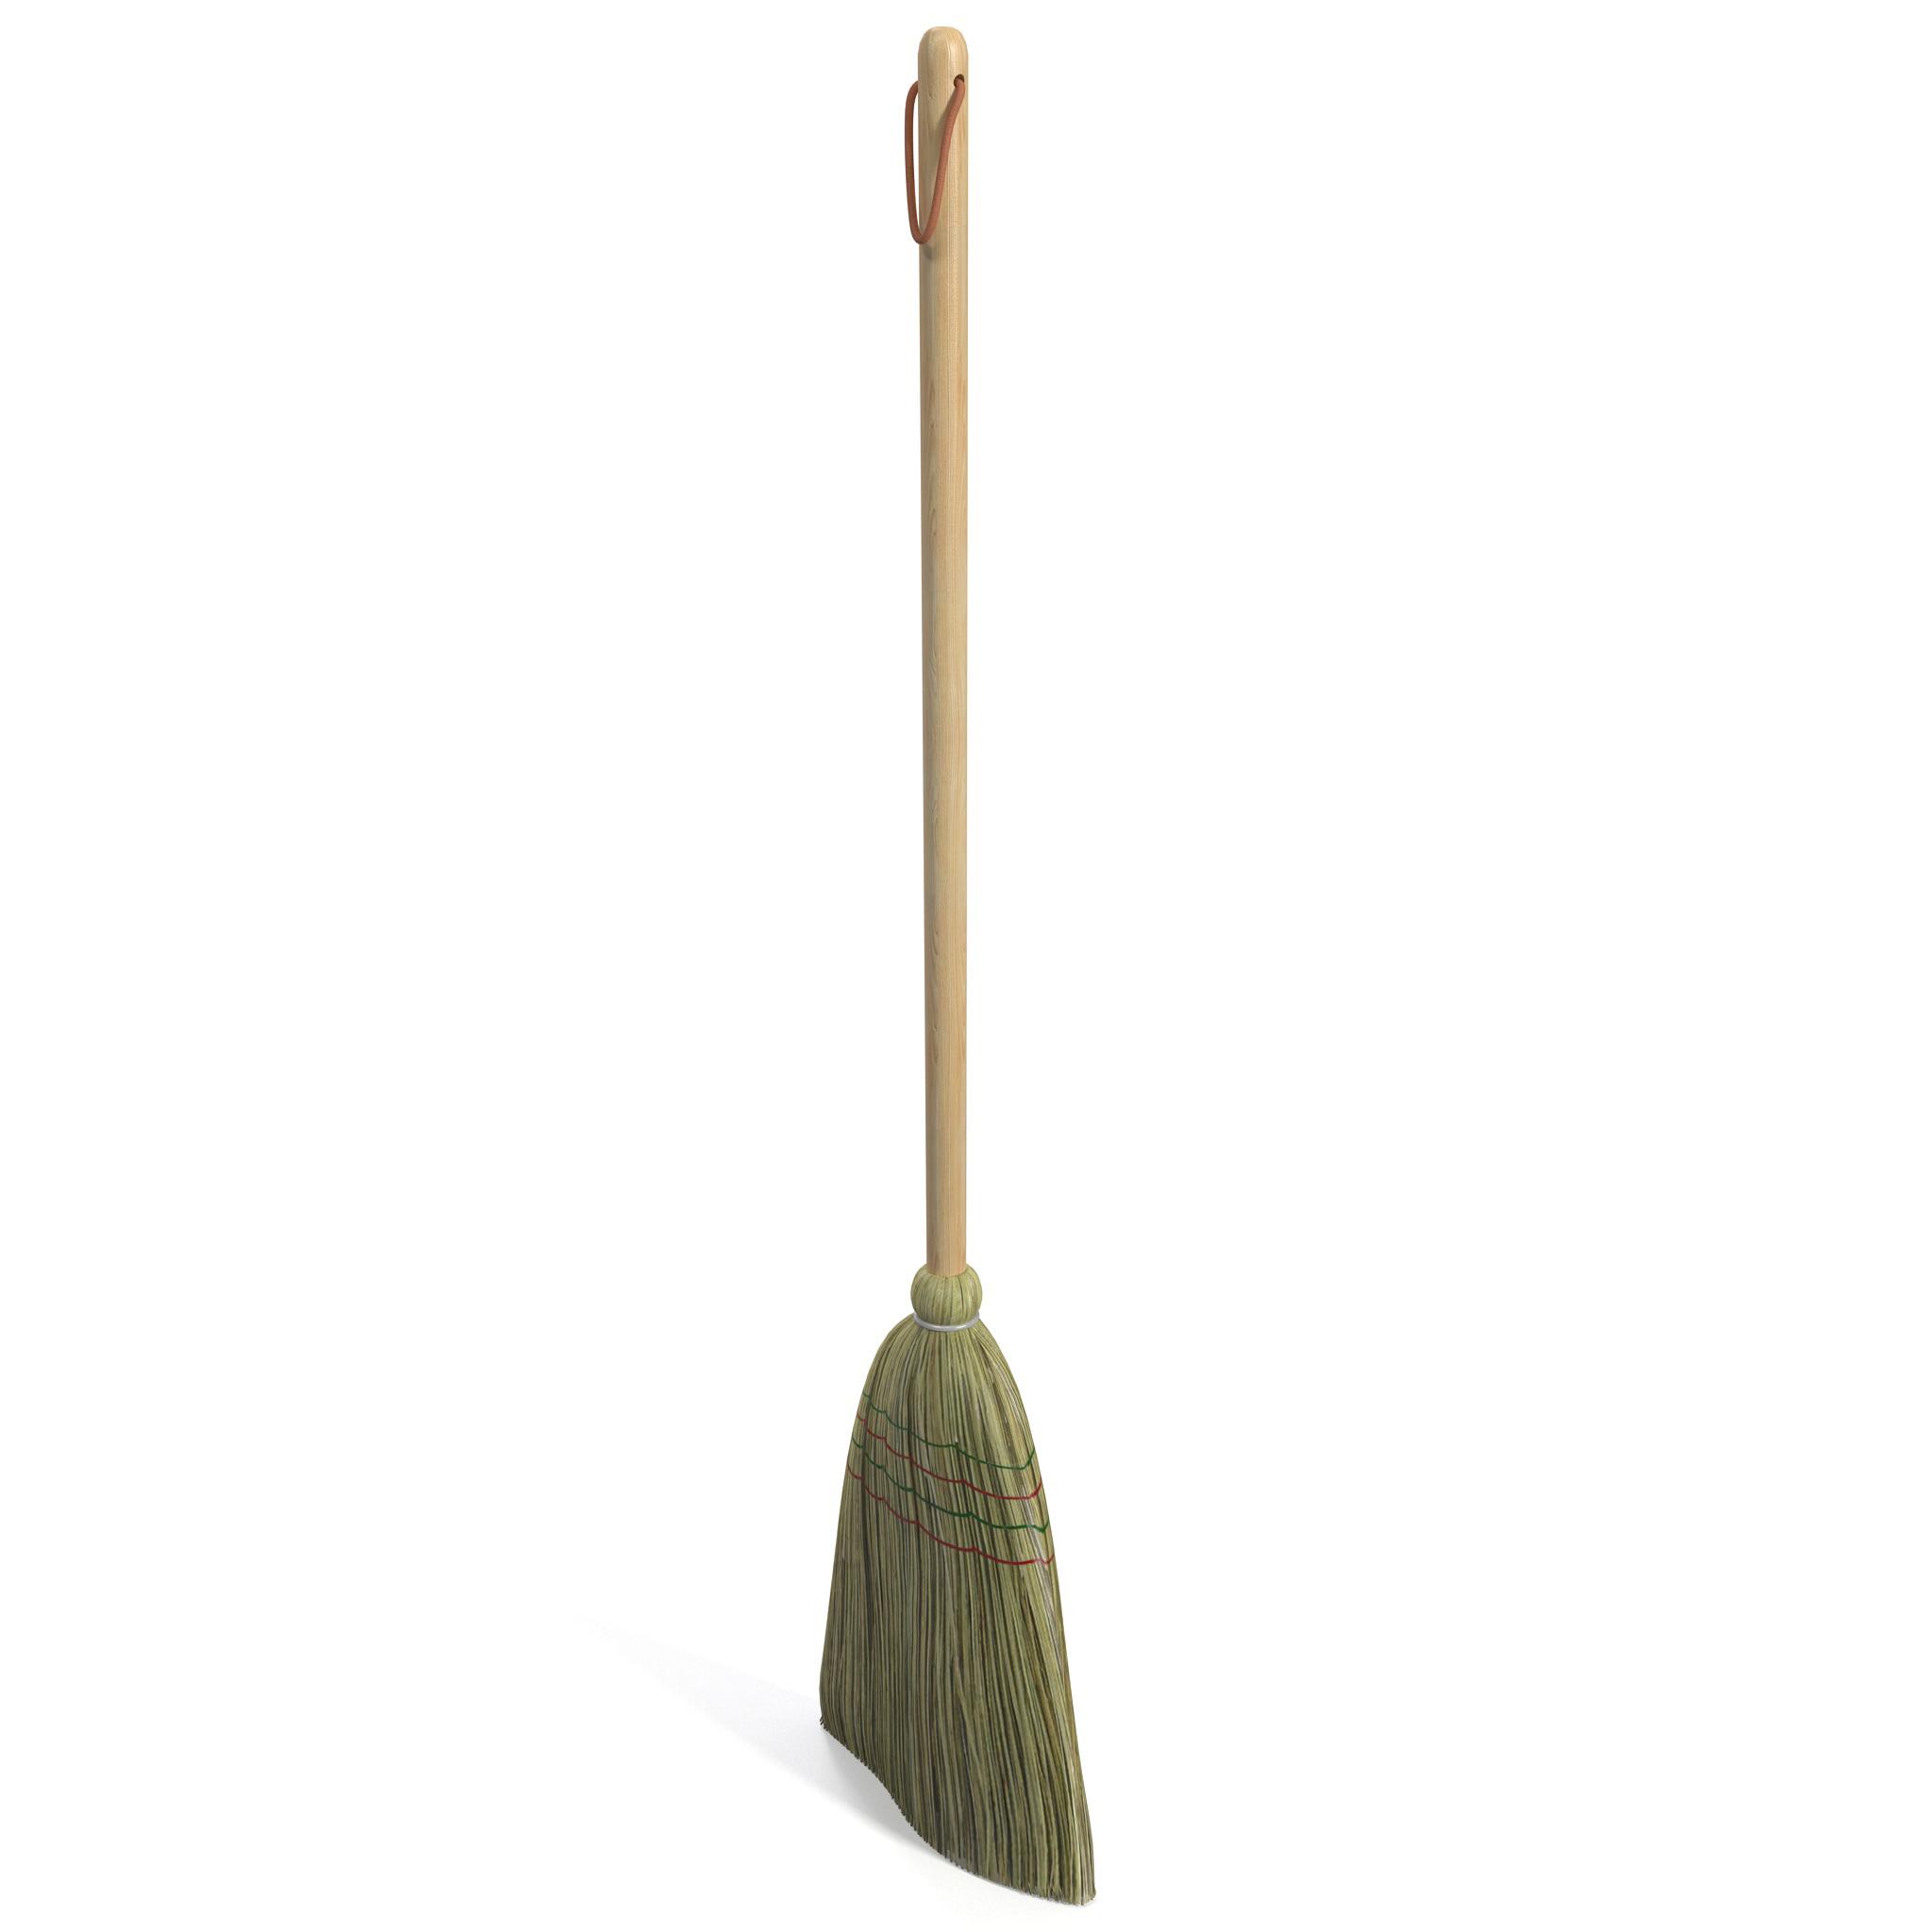 Broom_2.jpg